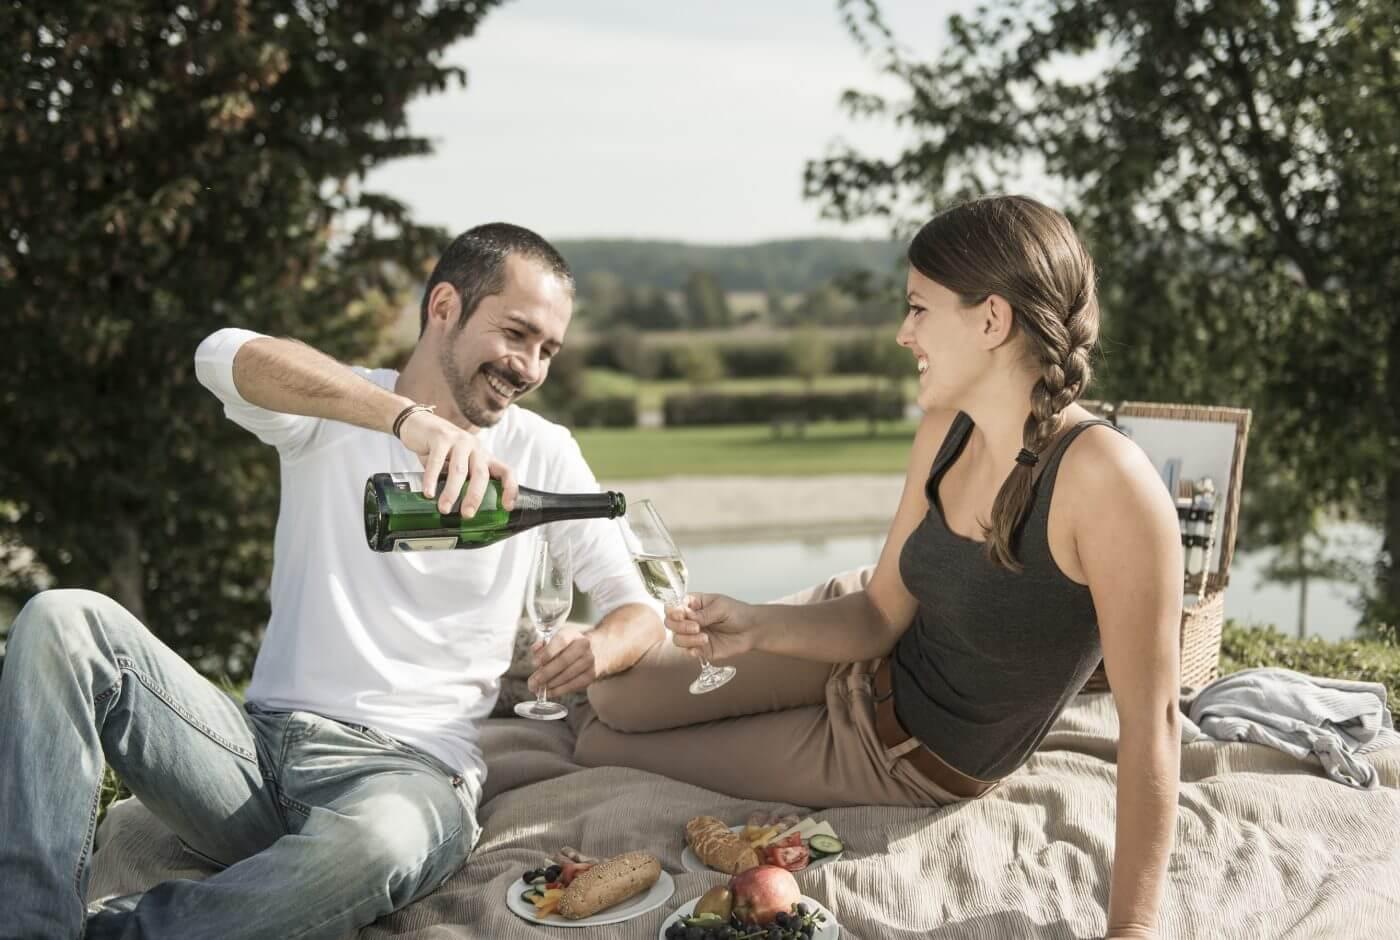 Picknick, Romantik